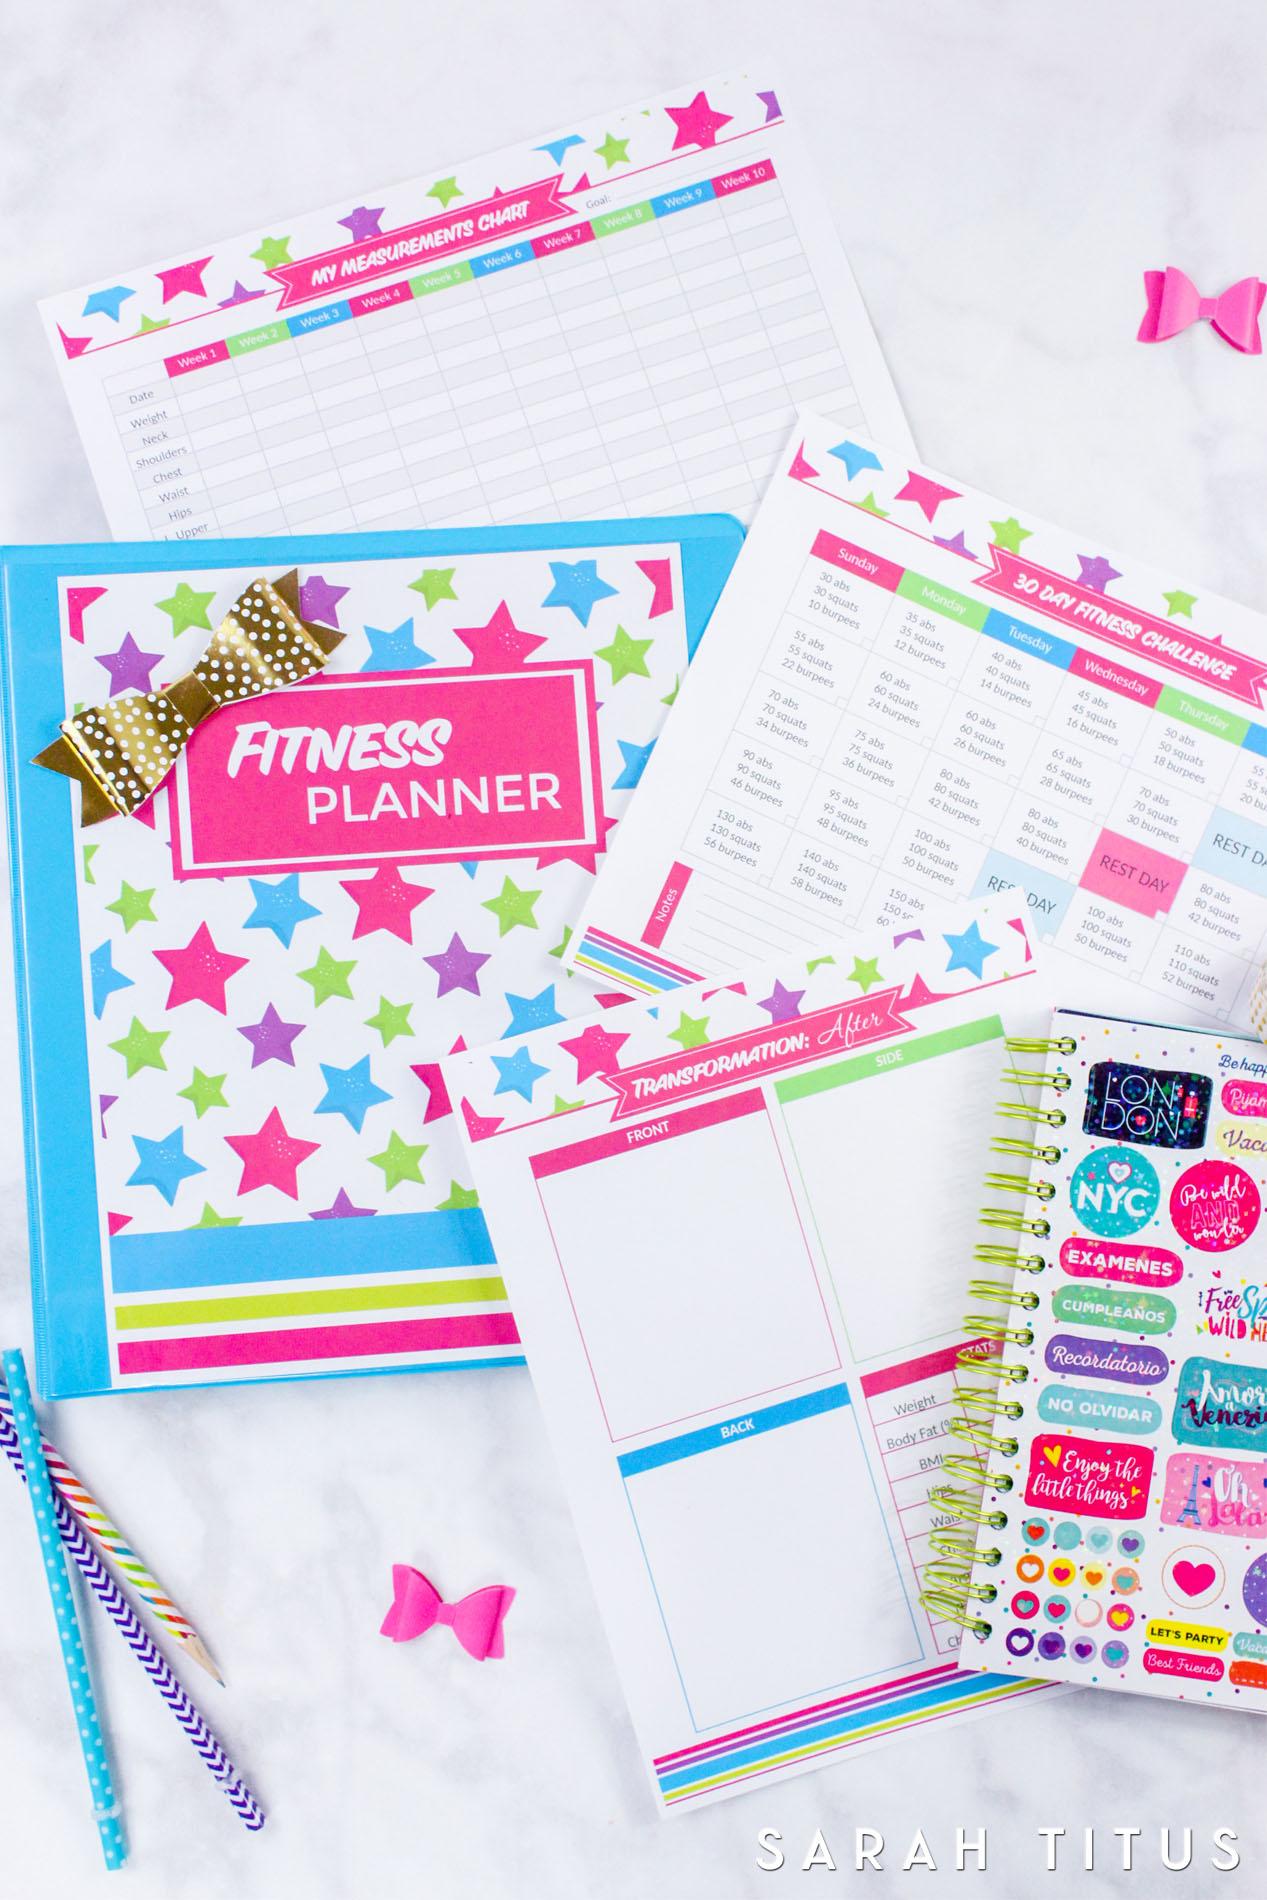 Fitness Planner - Sarah Titus - Free Printable Fitness Planner